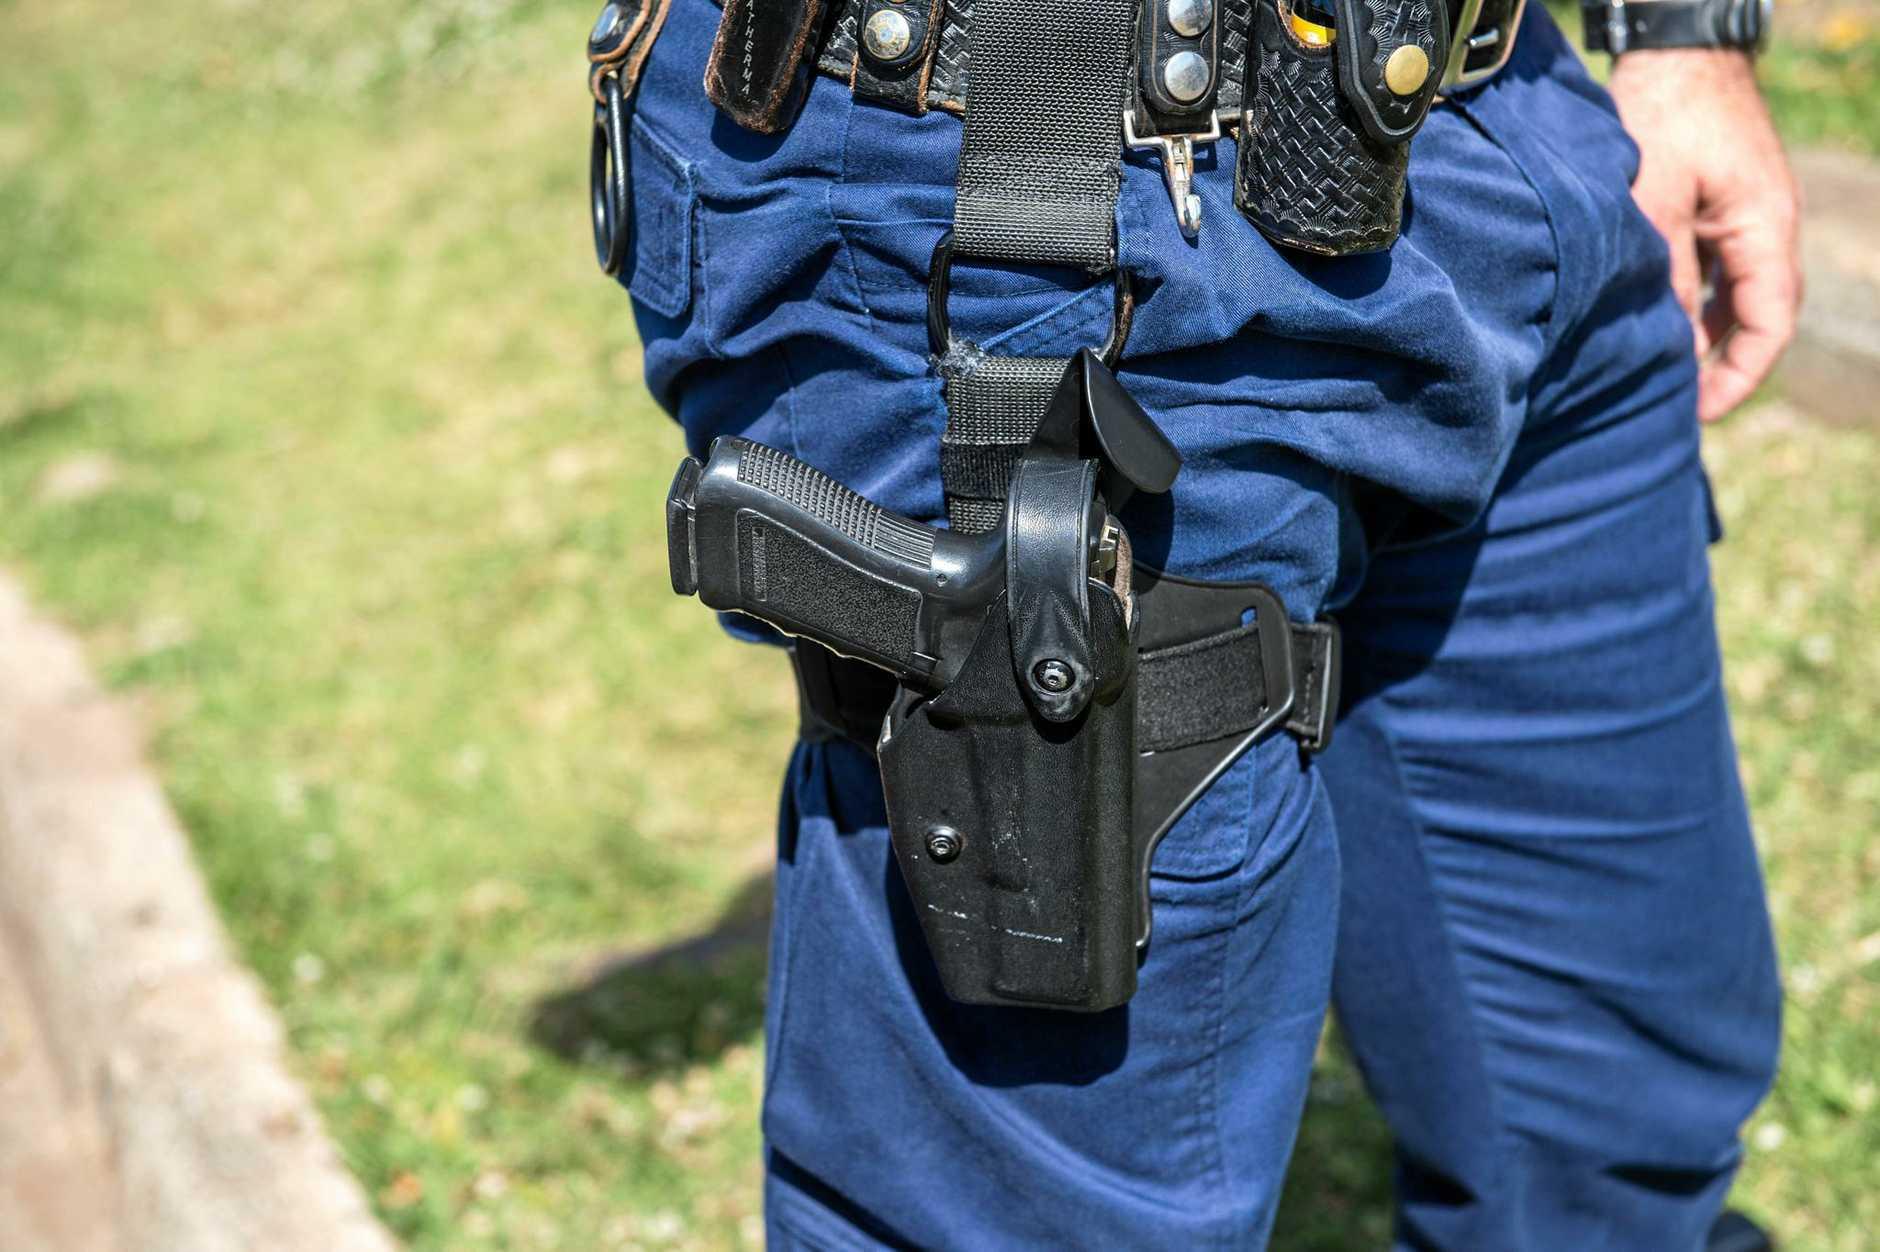 NSW police generic pistol gun. 07 October 2016